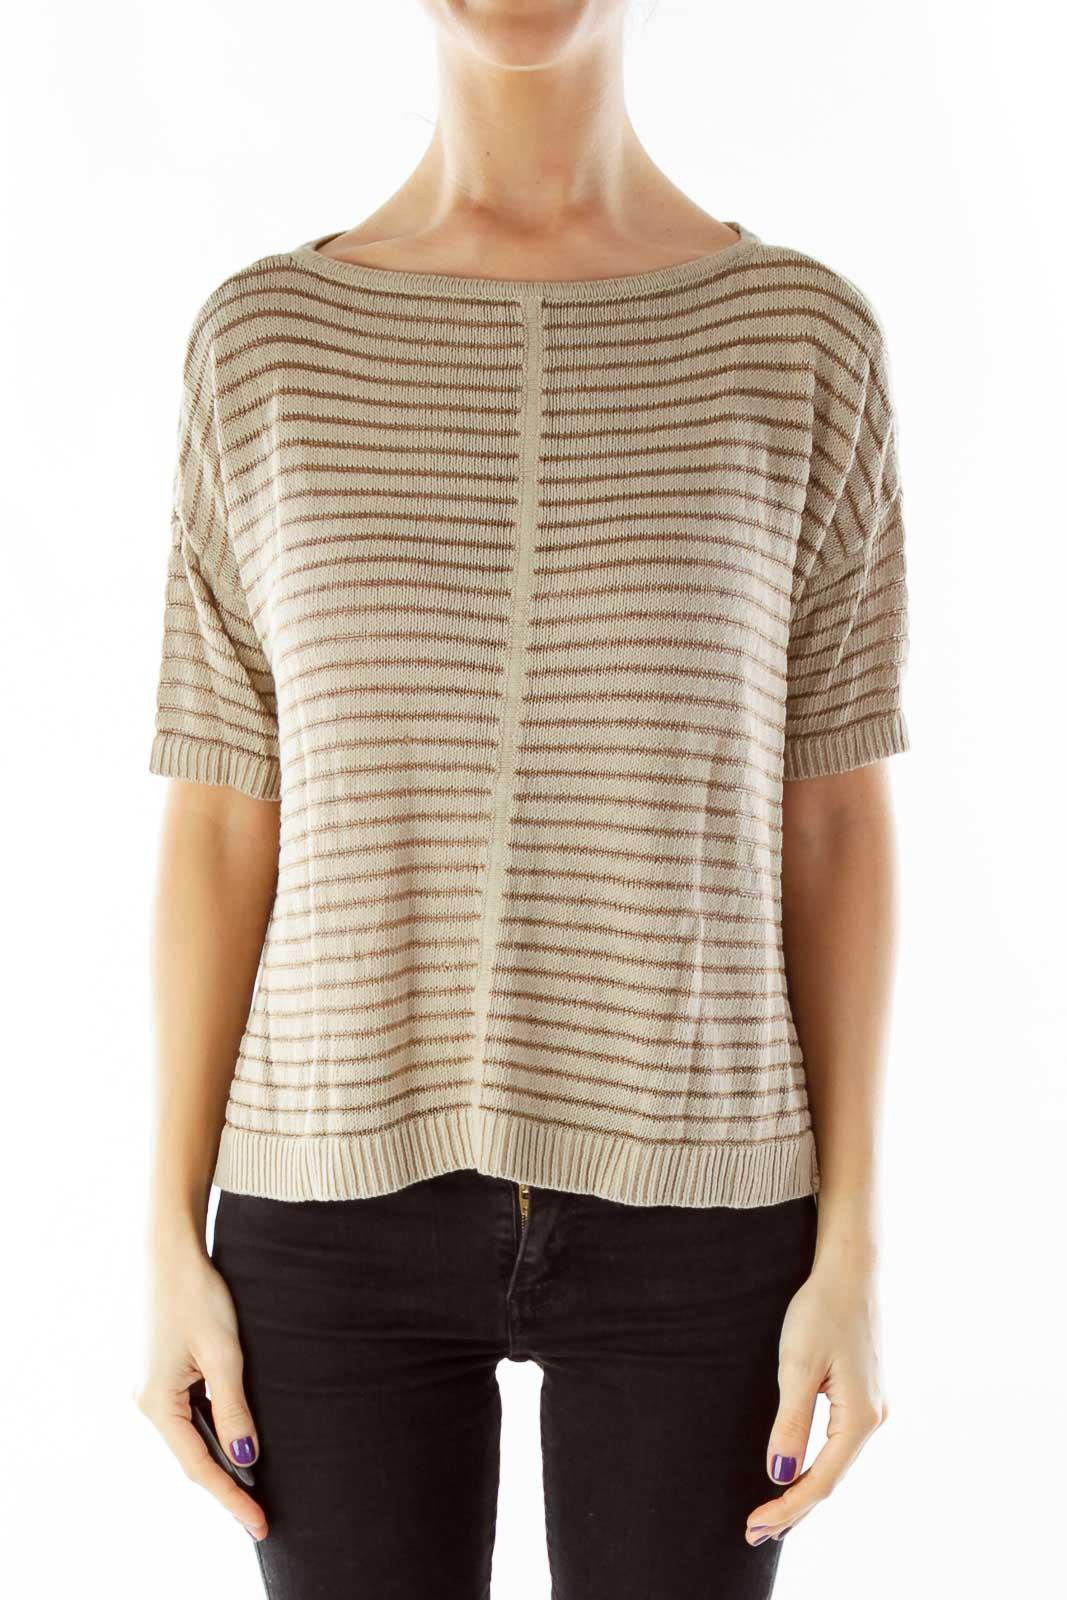 Brown Striped Knit Top